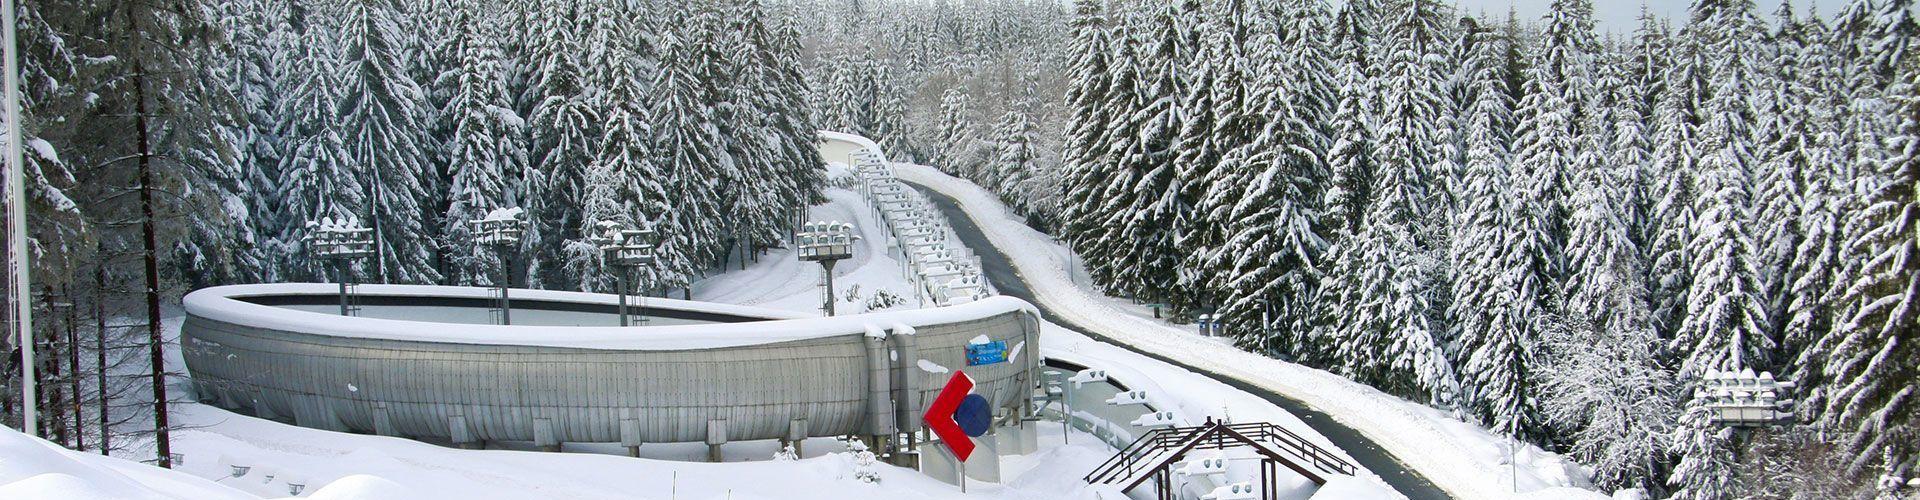 bobbahn-altenberg_panorama